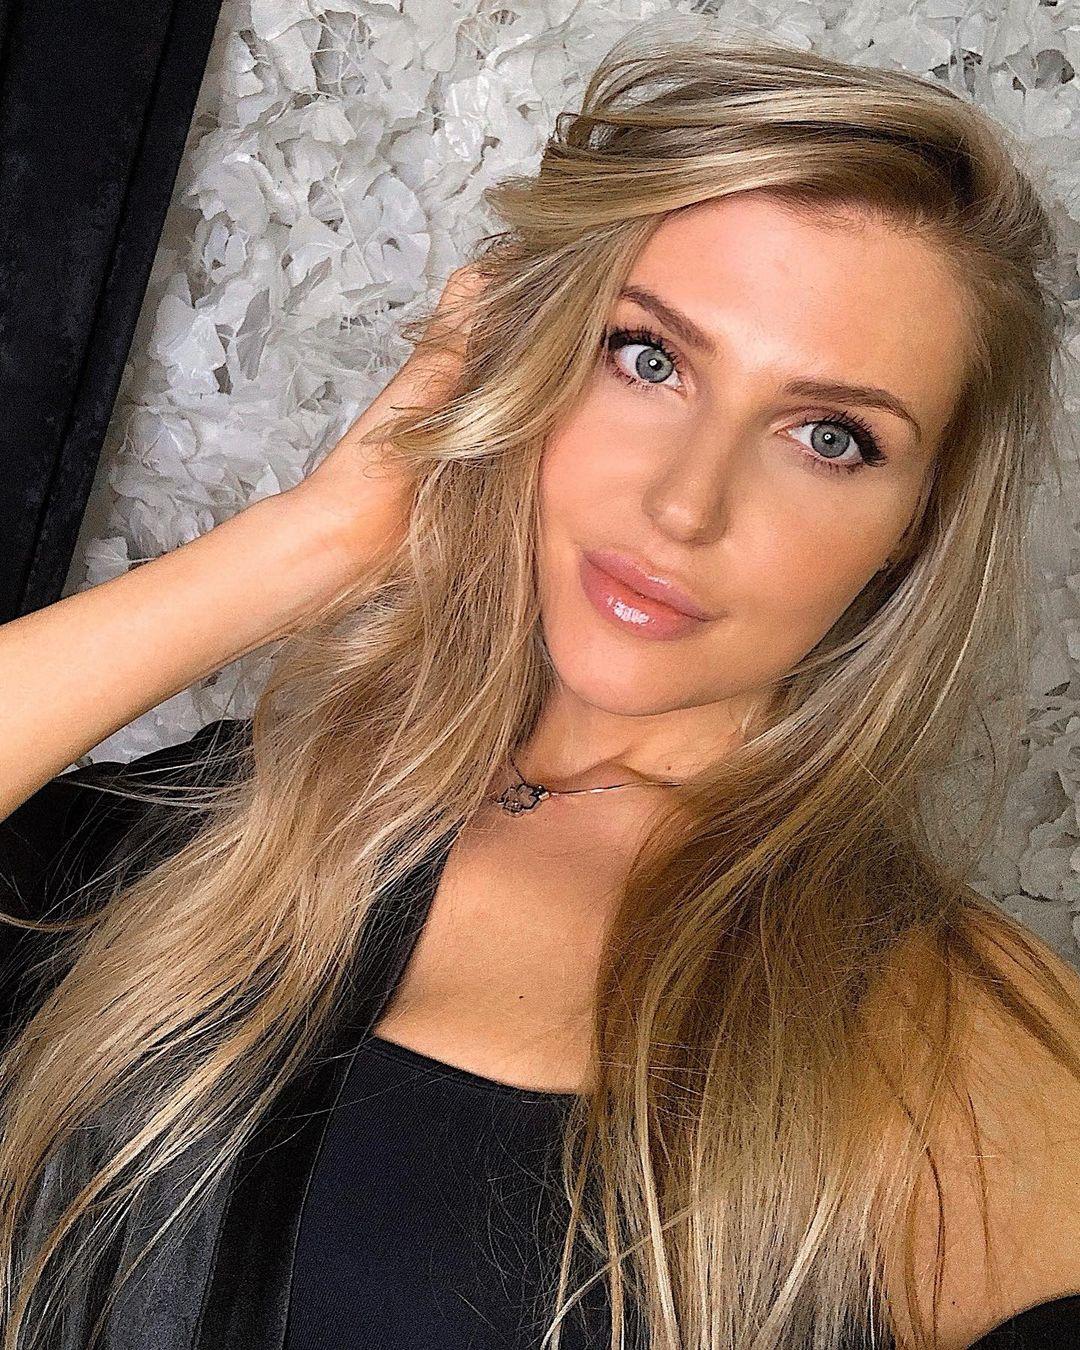 Yuliana-Sholomitskaya-Wallpapers-Insta-Fit-Bio-16